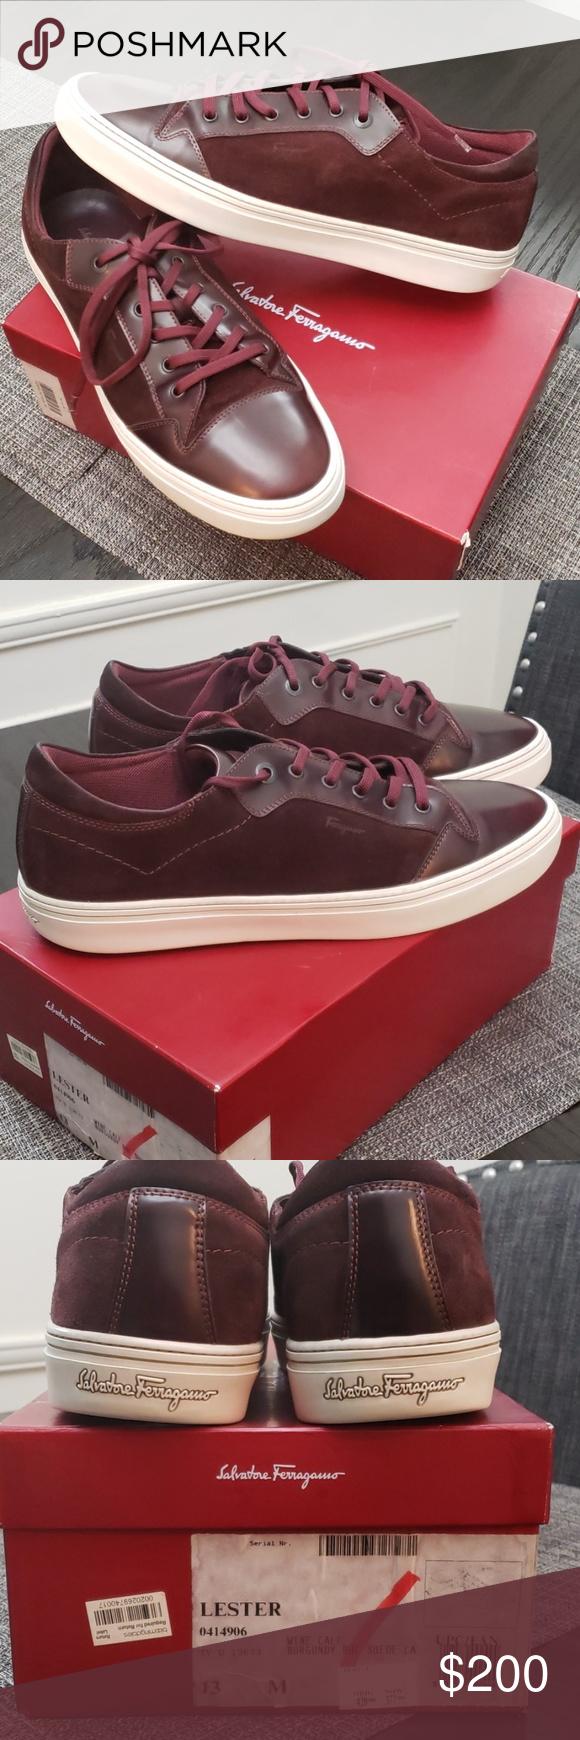 Sneakers, Salvatore ferragamo shoes